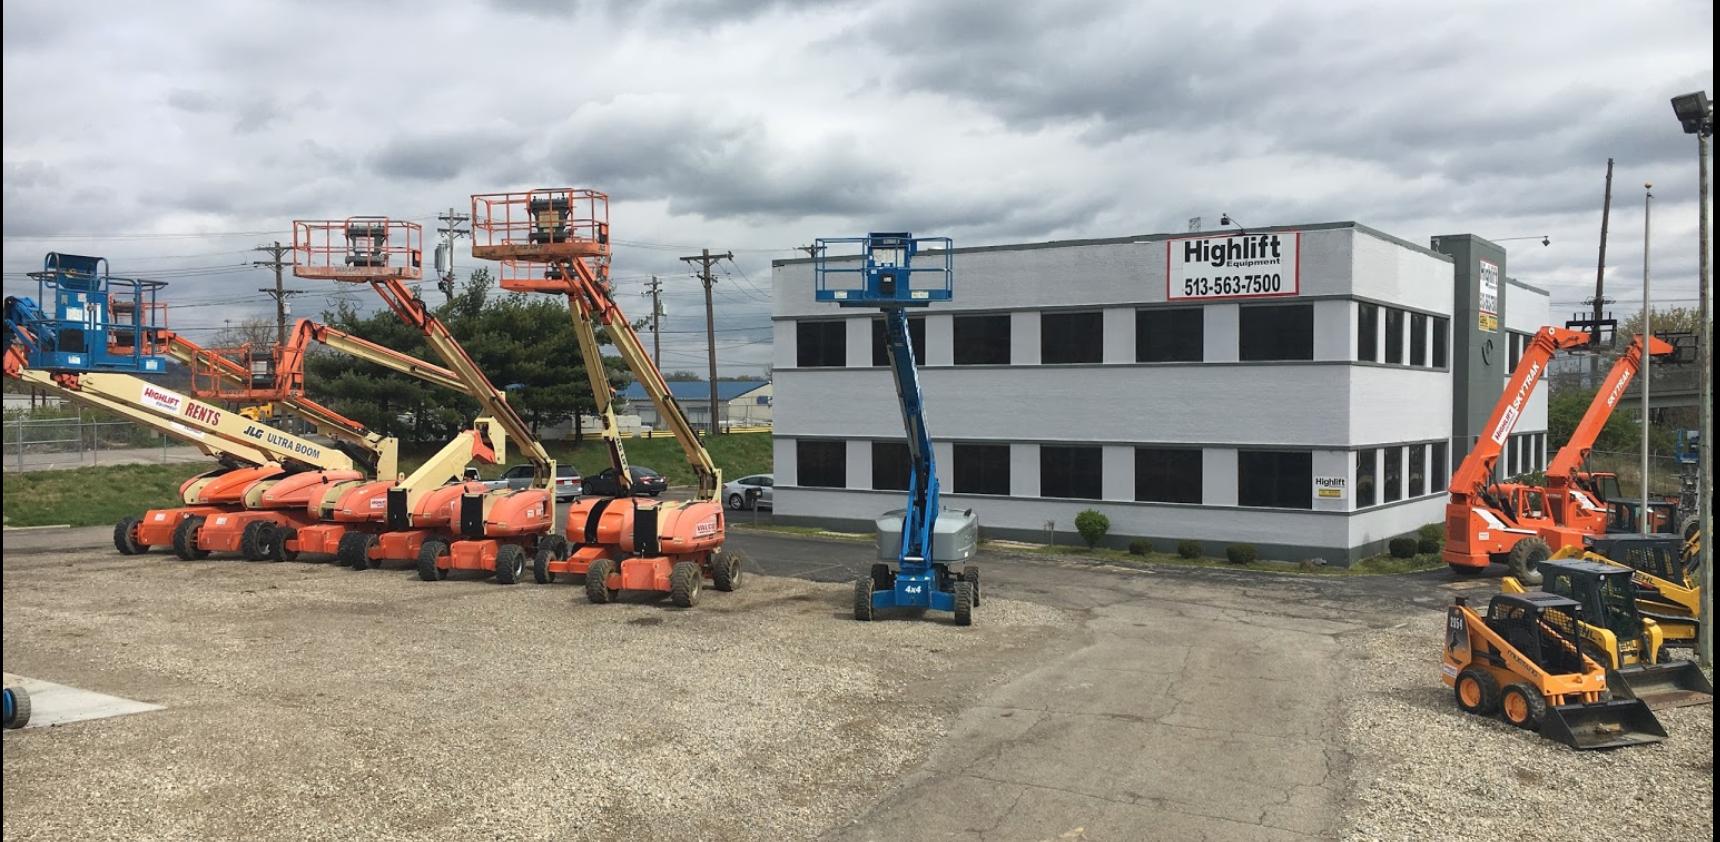 Highlift Equipment of Cincinnati